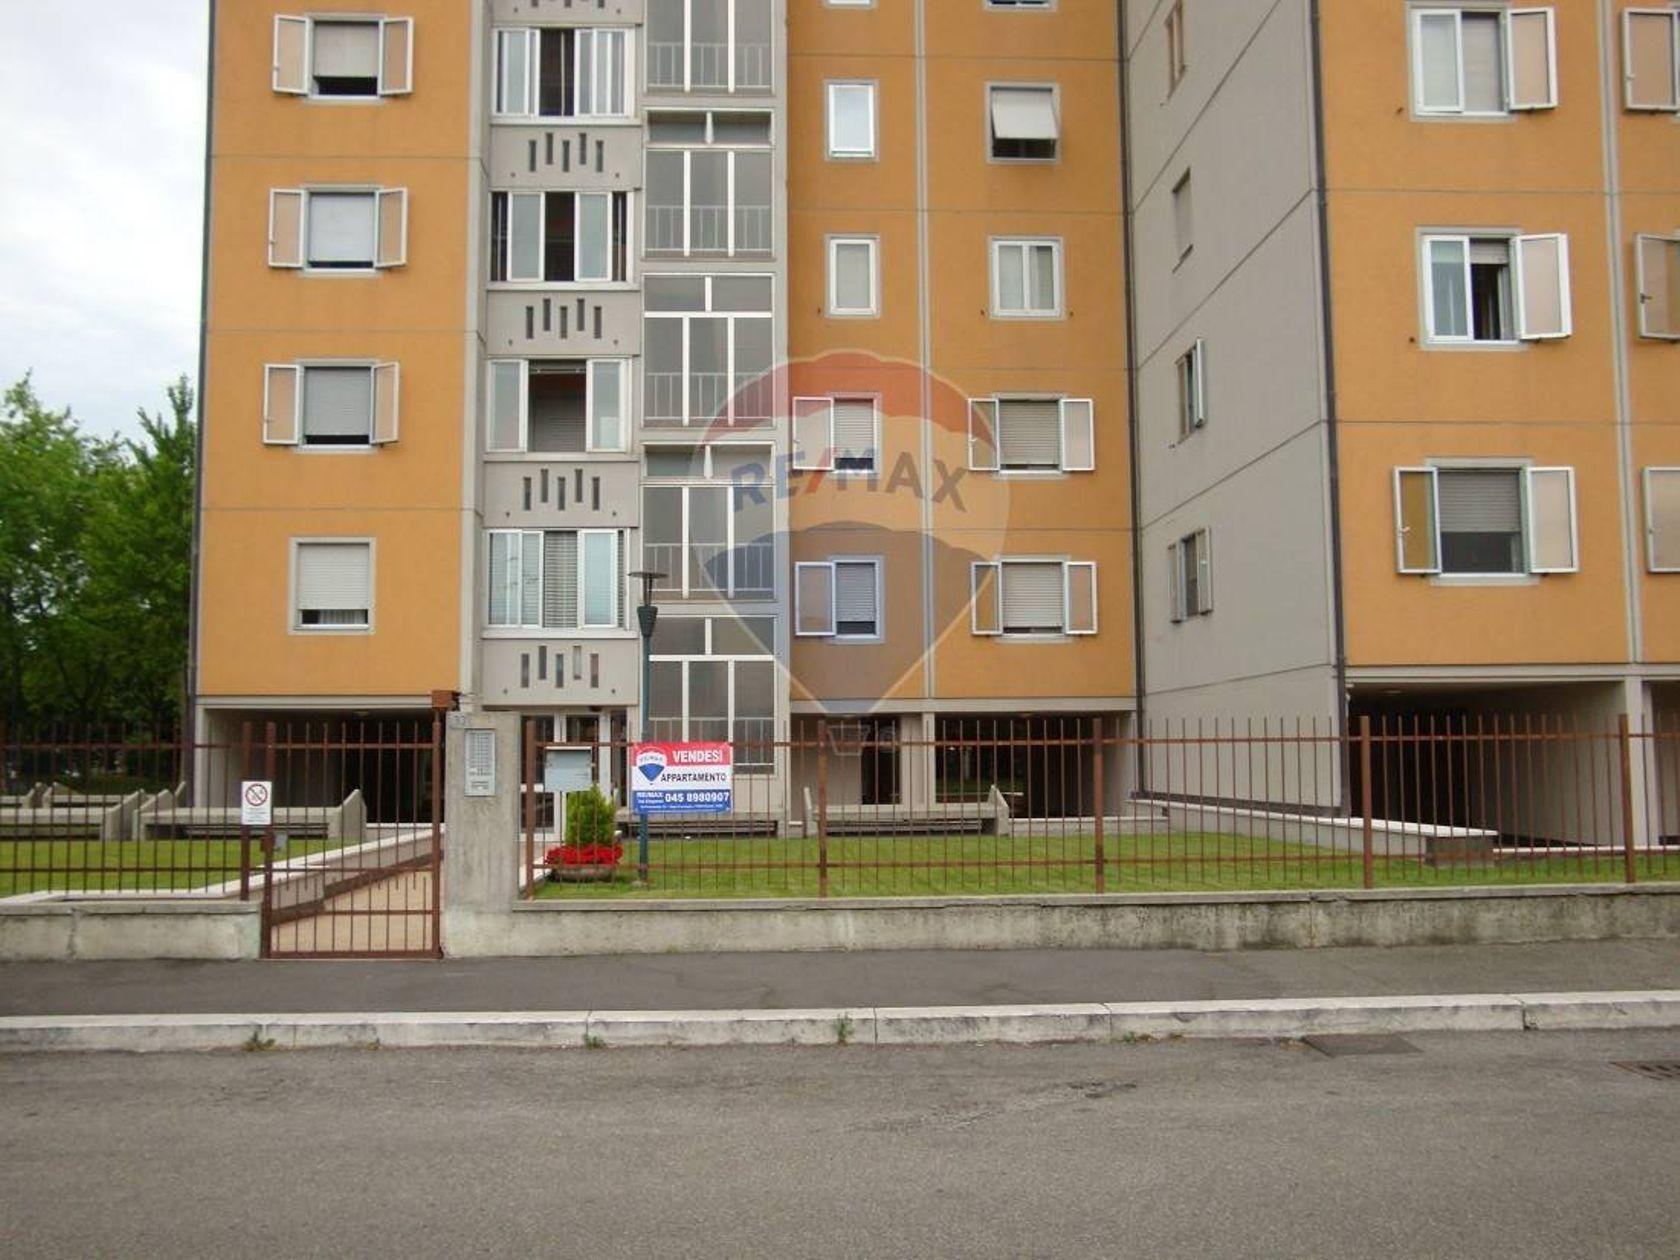 Appartamento Borgo Venezia, Verona, VR Vendita - Foto 2